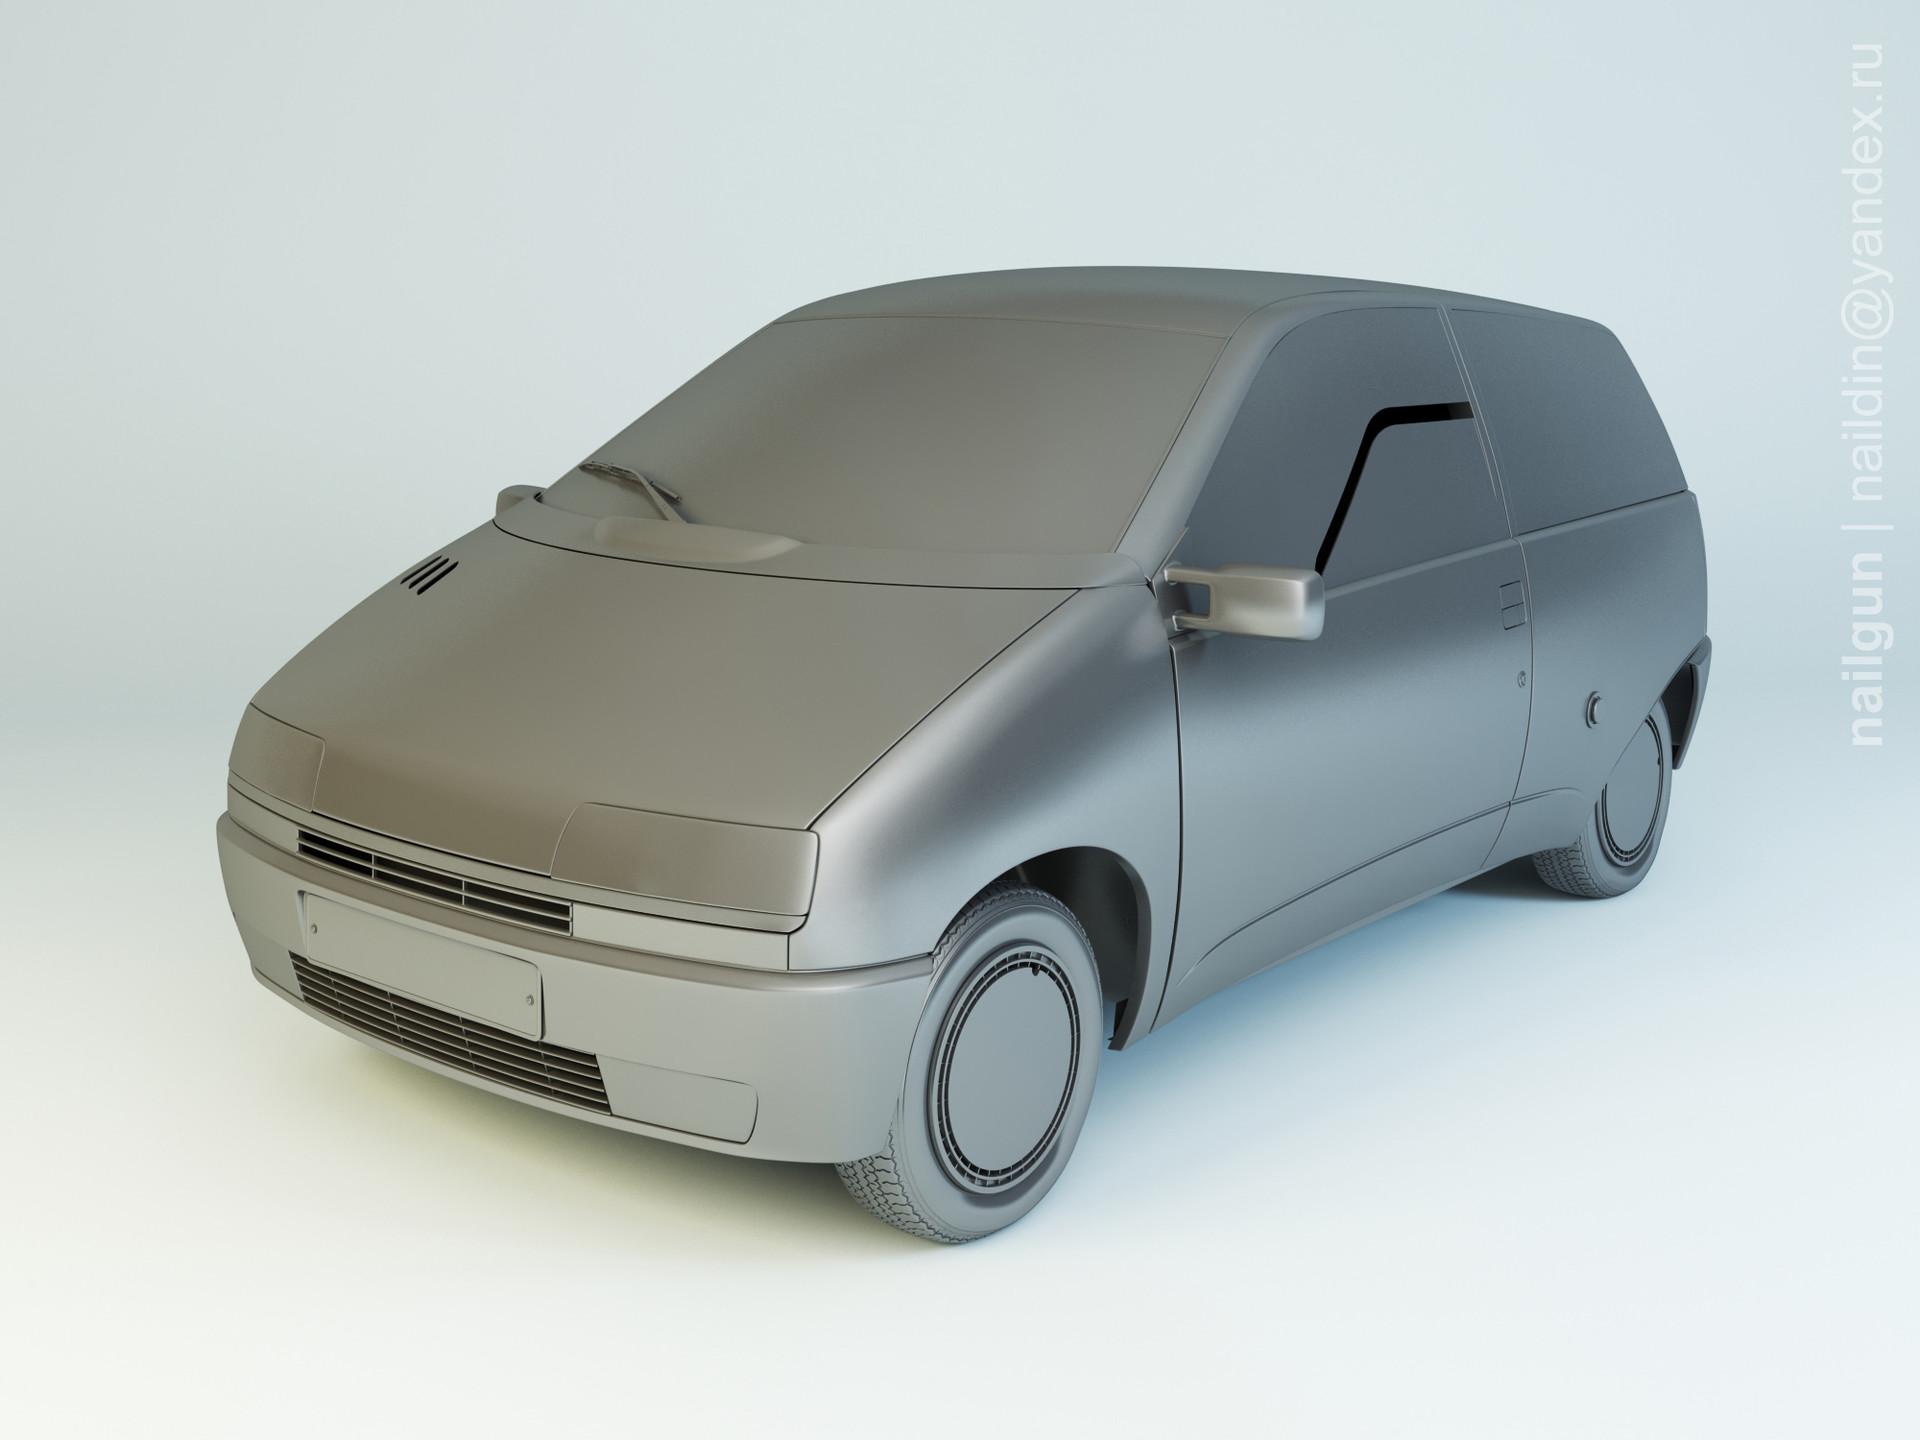 Nail khusnutdinov al 142 002 nami 0288 compact modellling 0